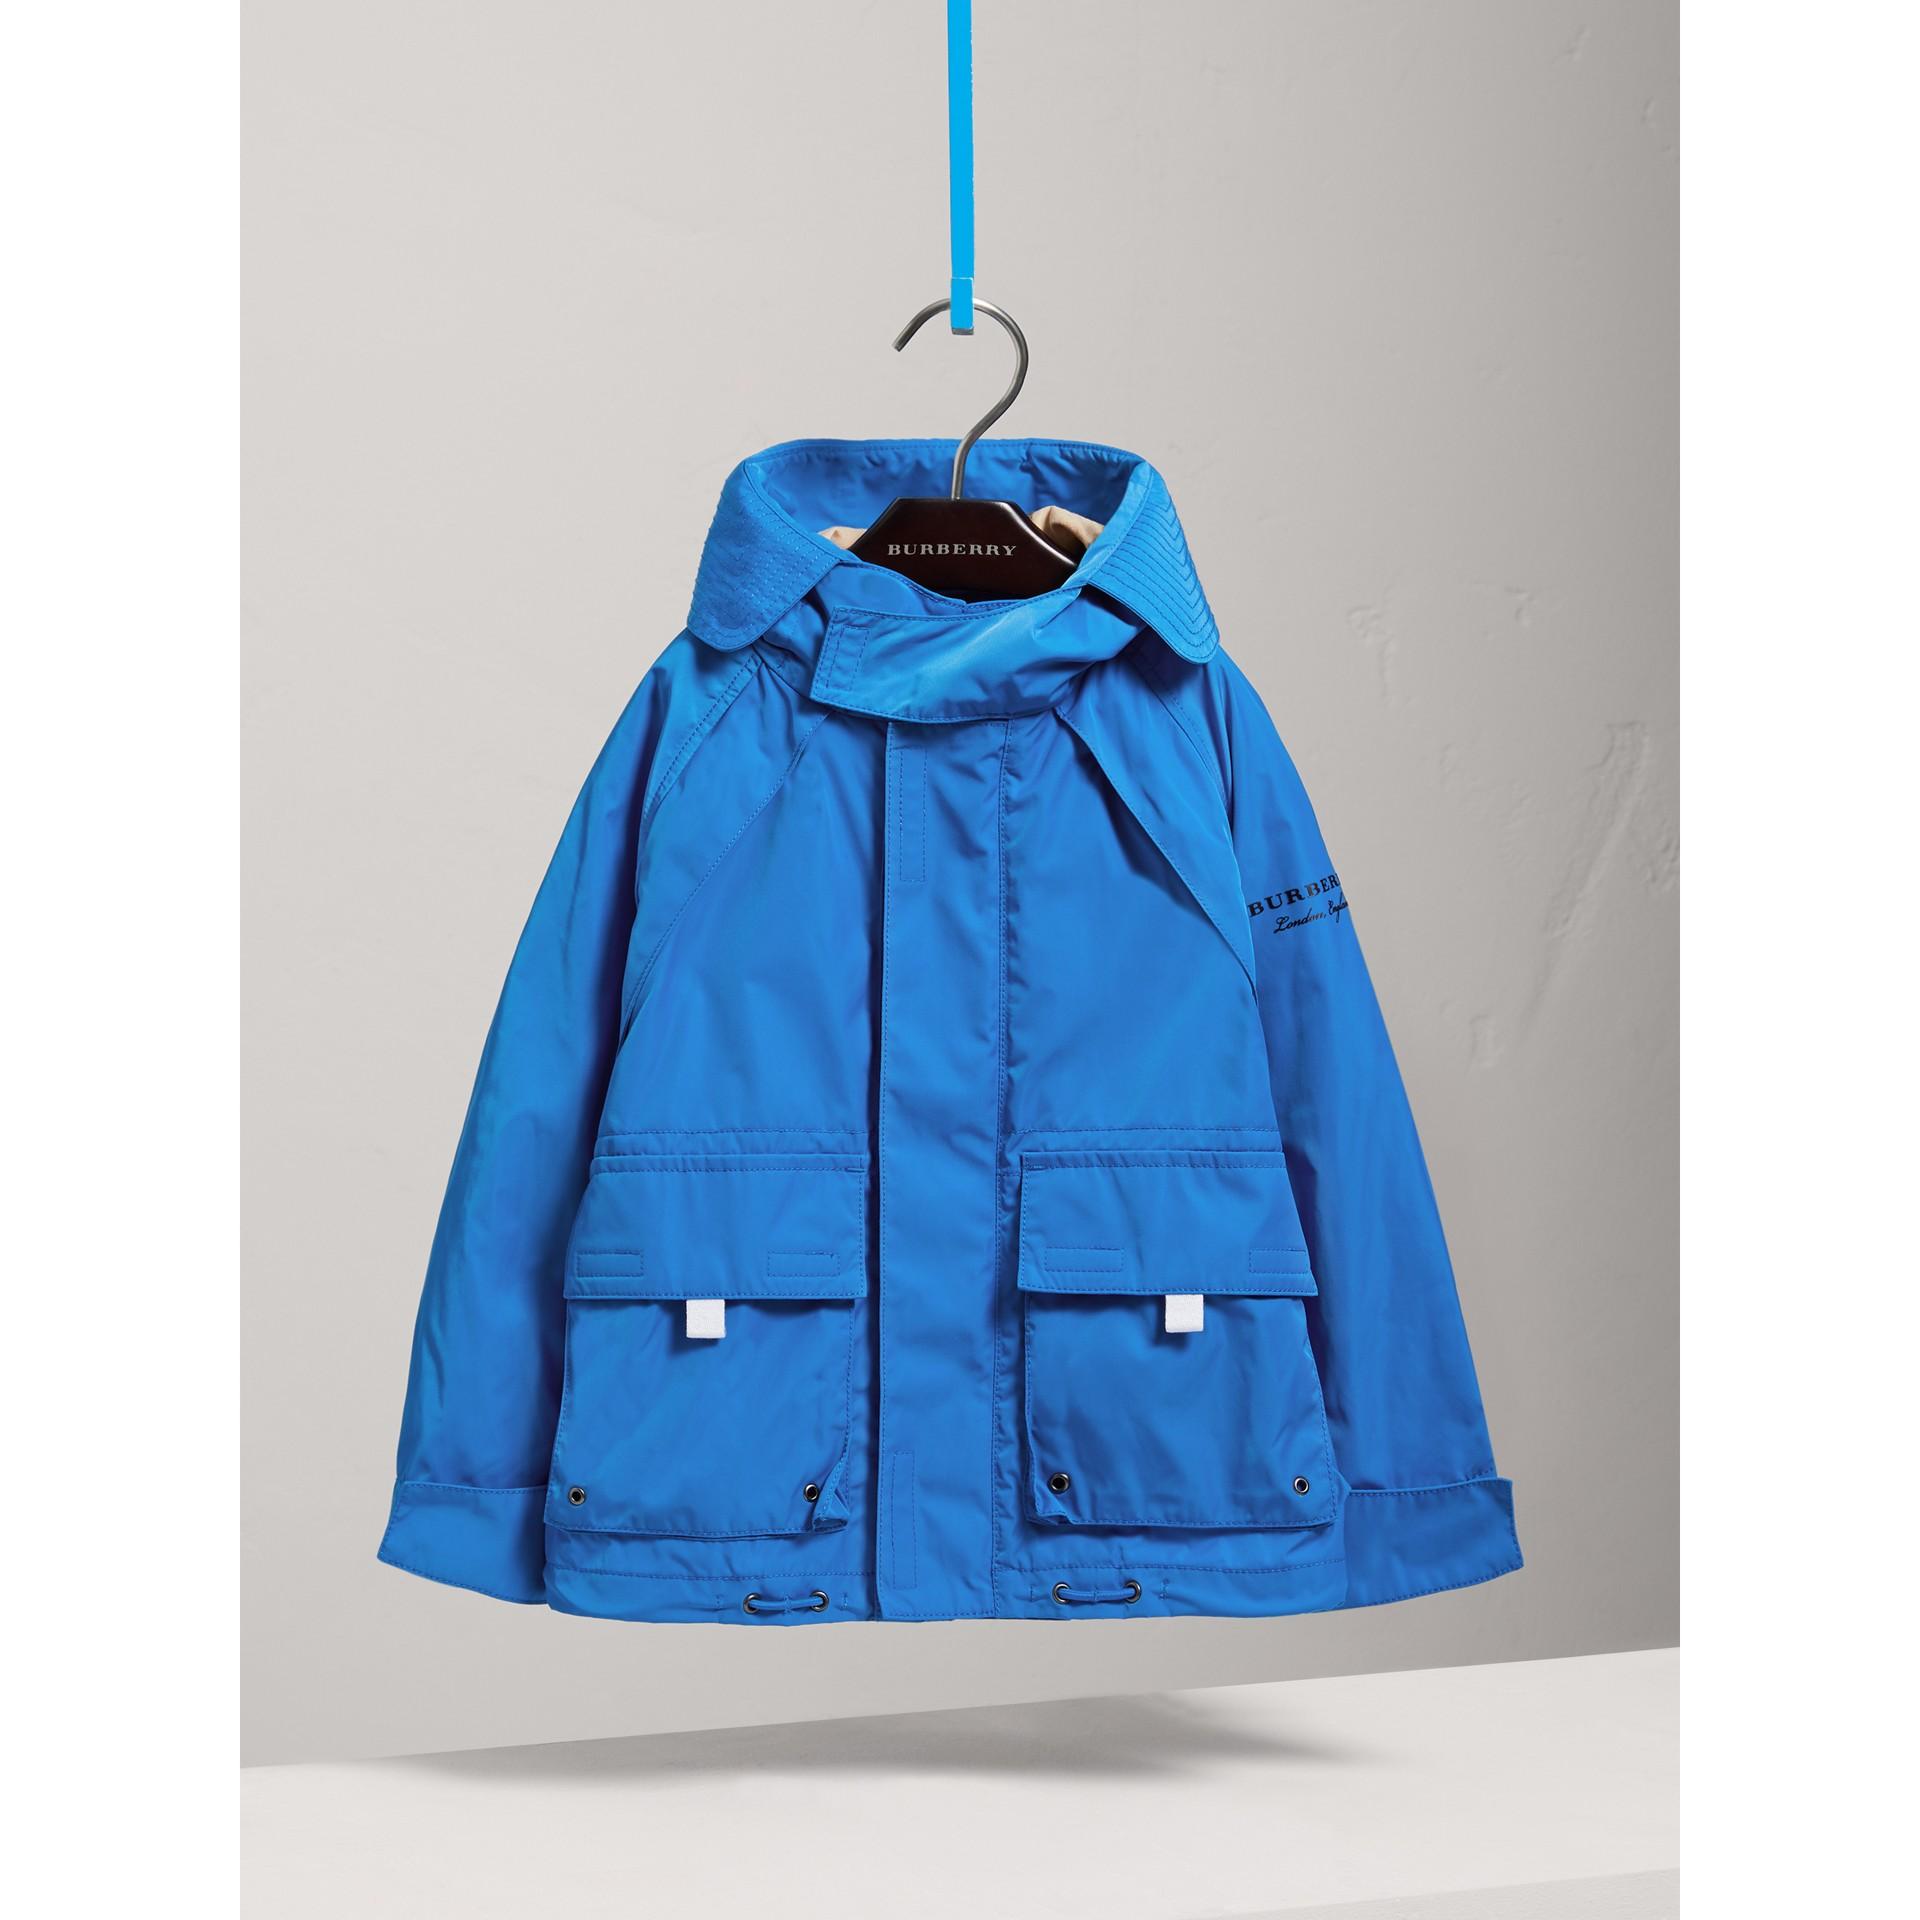 Feldjacke aus Taftgewebe mit Memory-Effekt und Kapuze (Azurblau) - Jungen | Burberry - Galerie-Bild 3